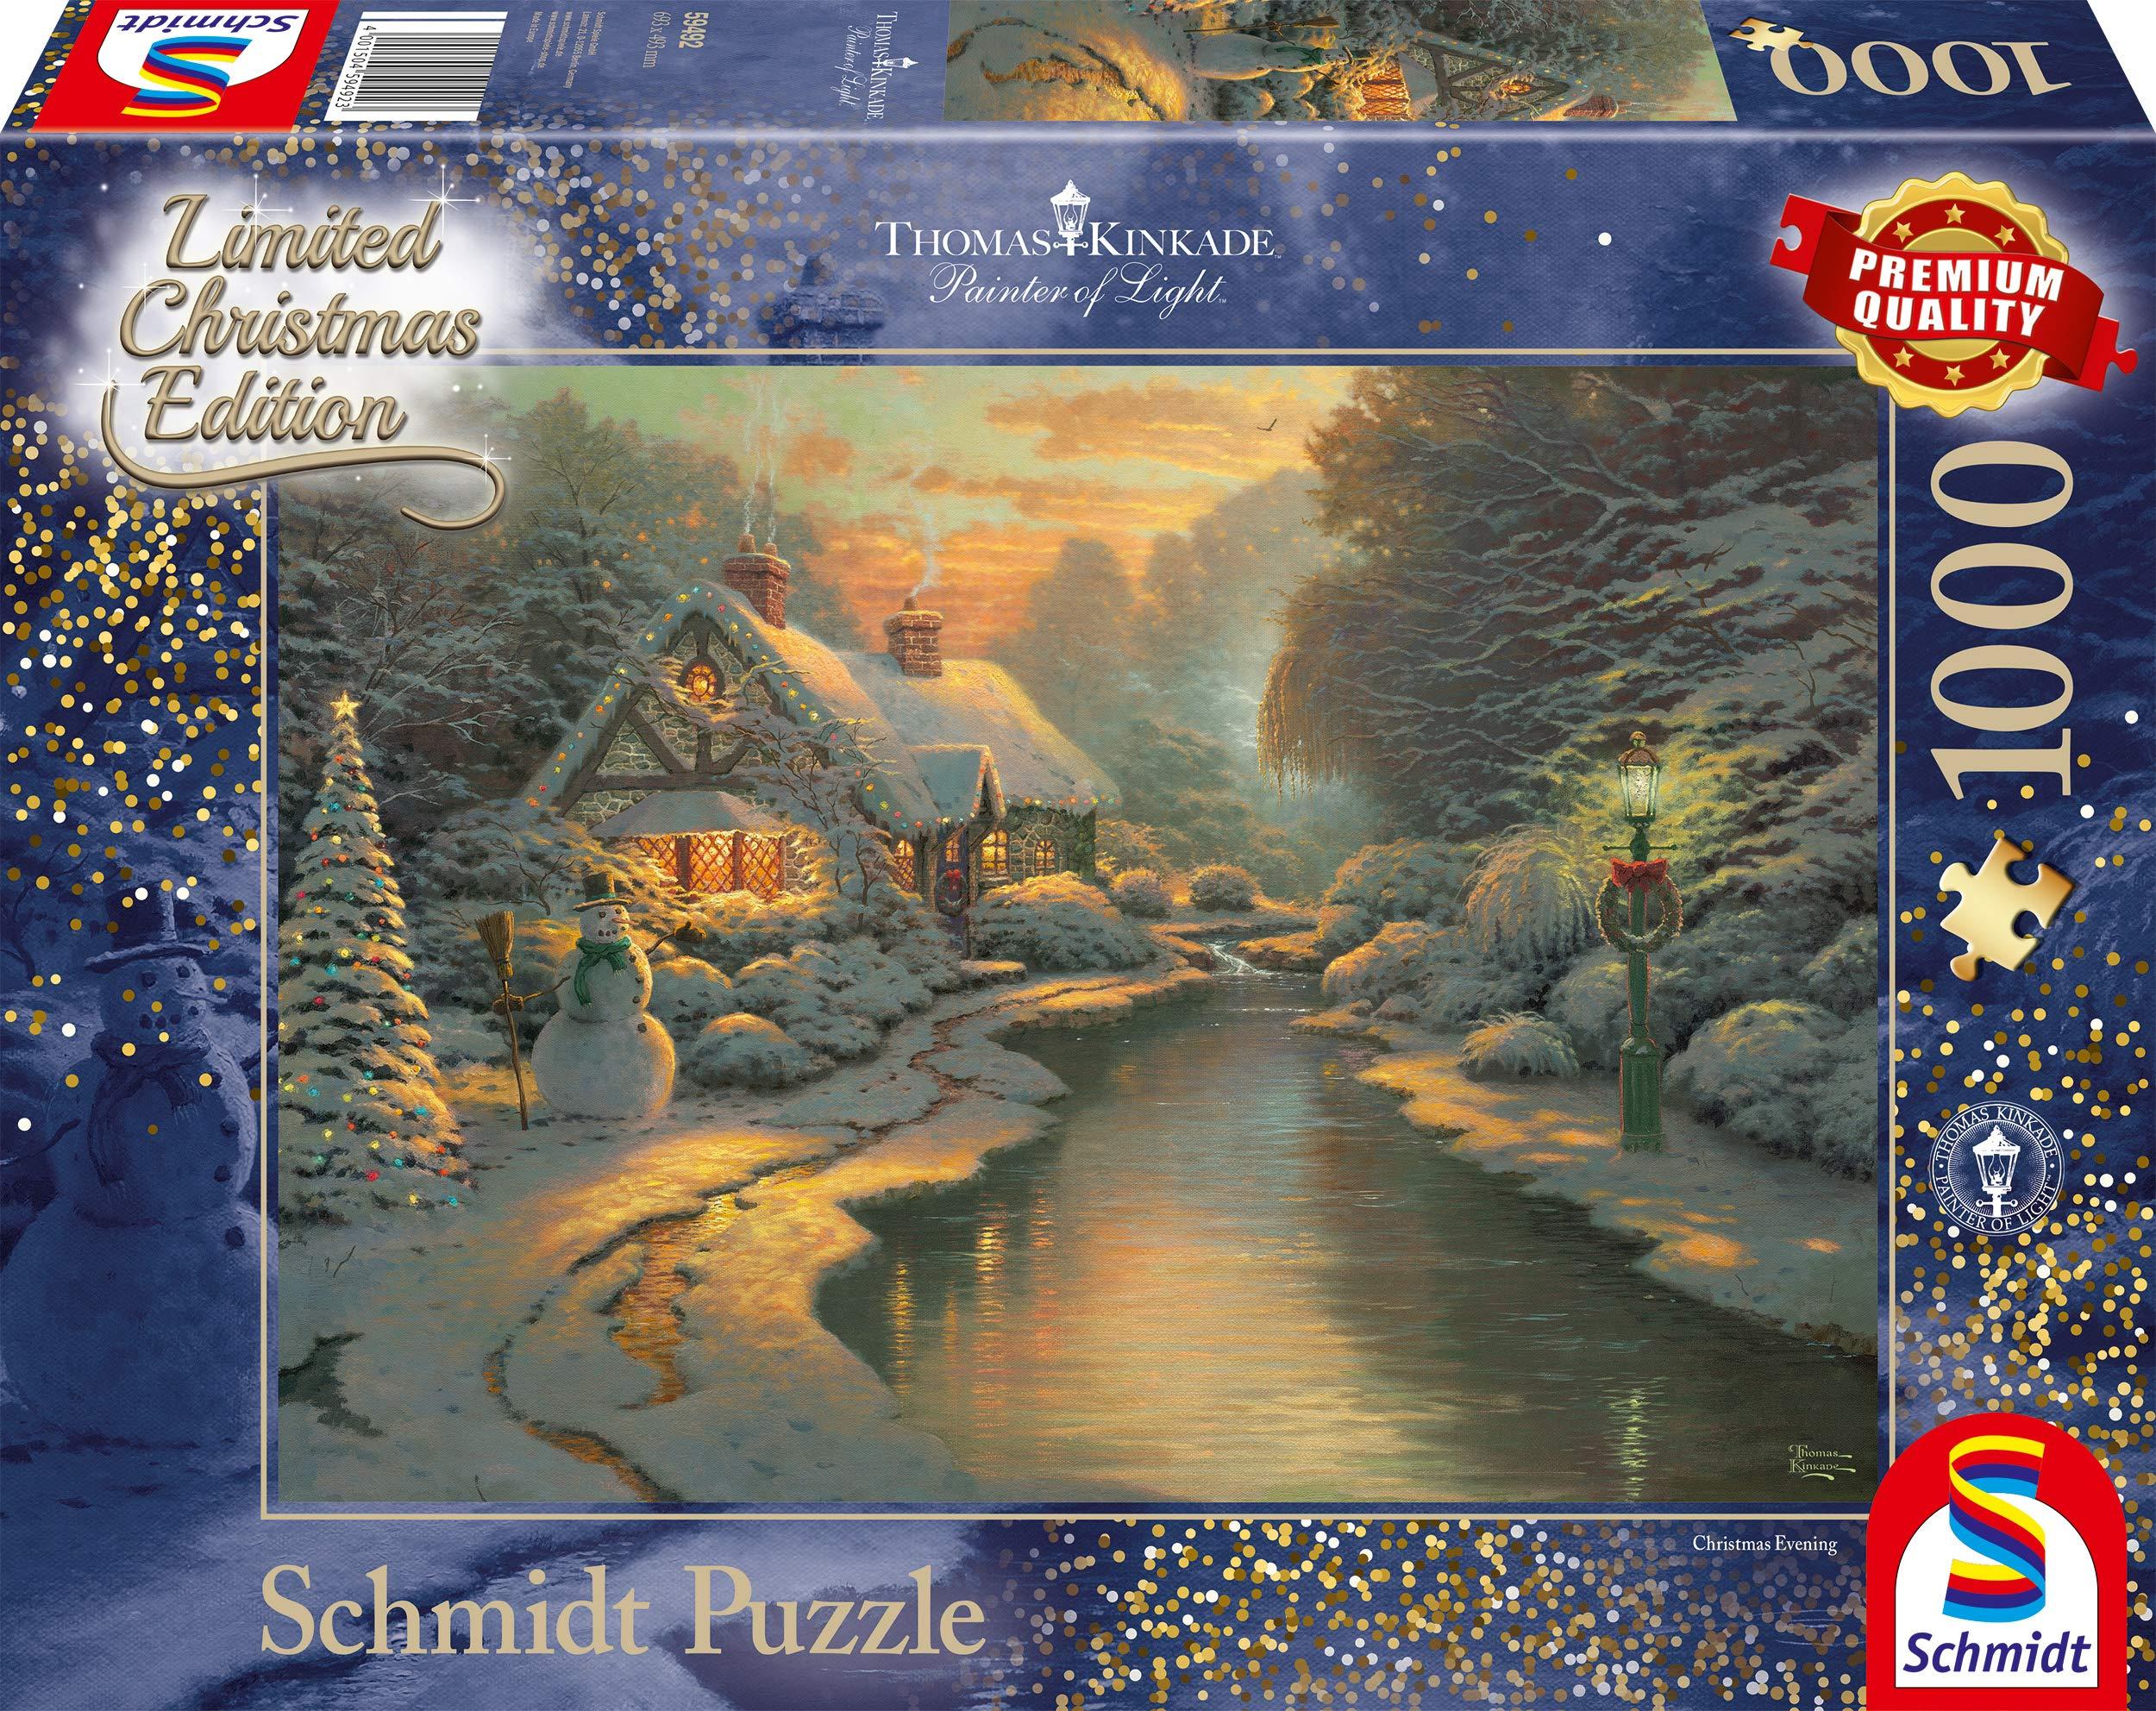 Schmidt-Spiele-Puzzle-59492-Thomas-Kinkade-Am-Weihnachtsabend-Limited-Edition-1000-Teile-bunt